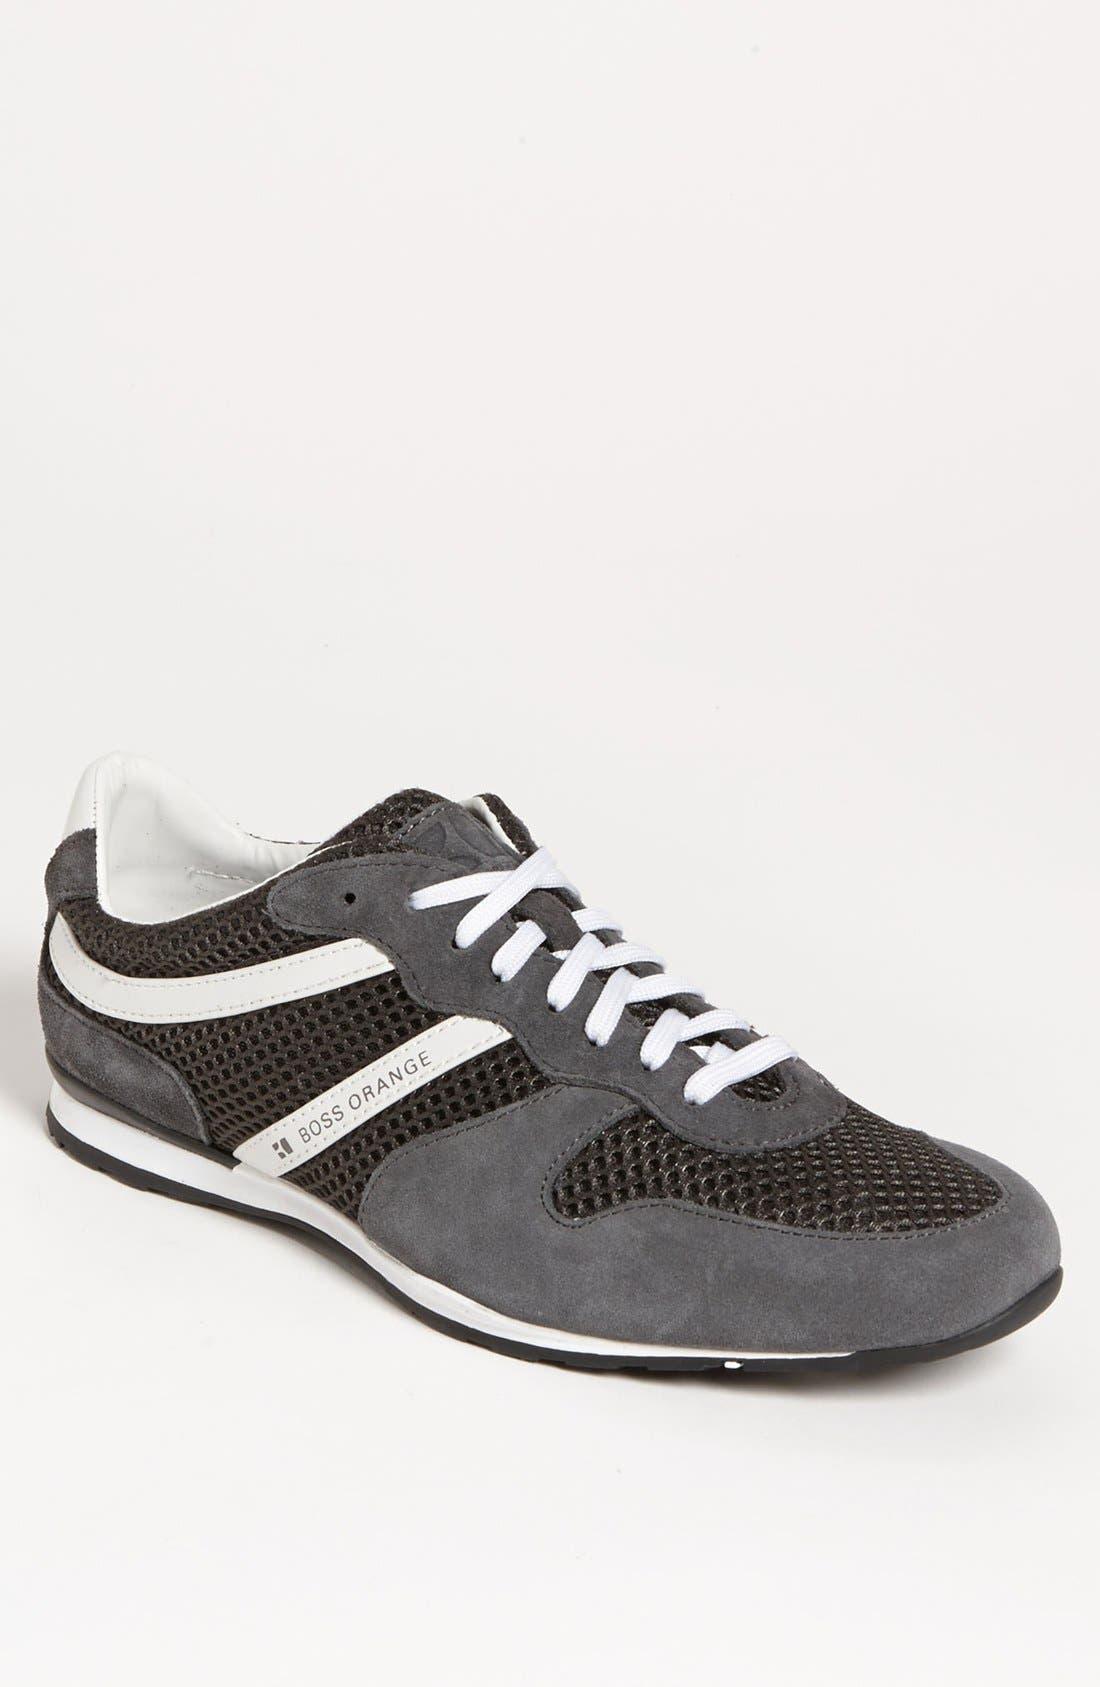 Main Image - BOSS Orange 'Orlenno' Sneaker